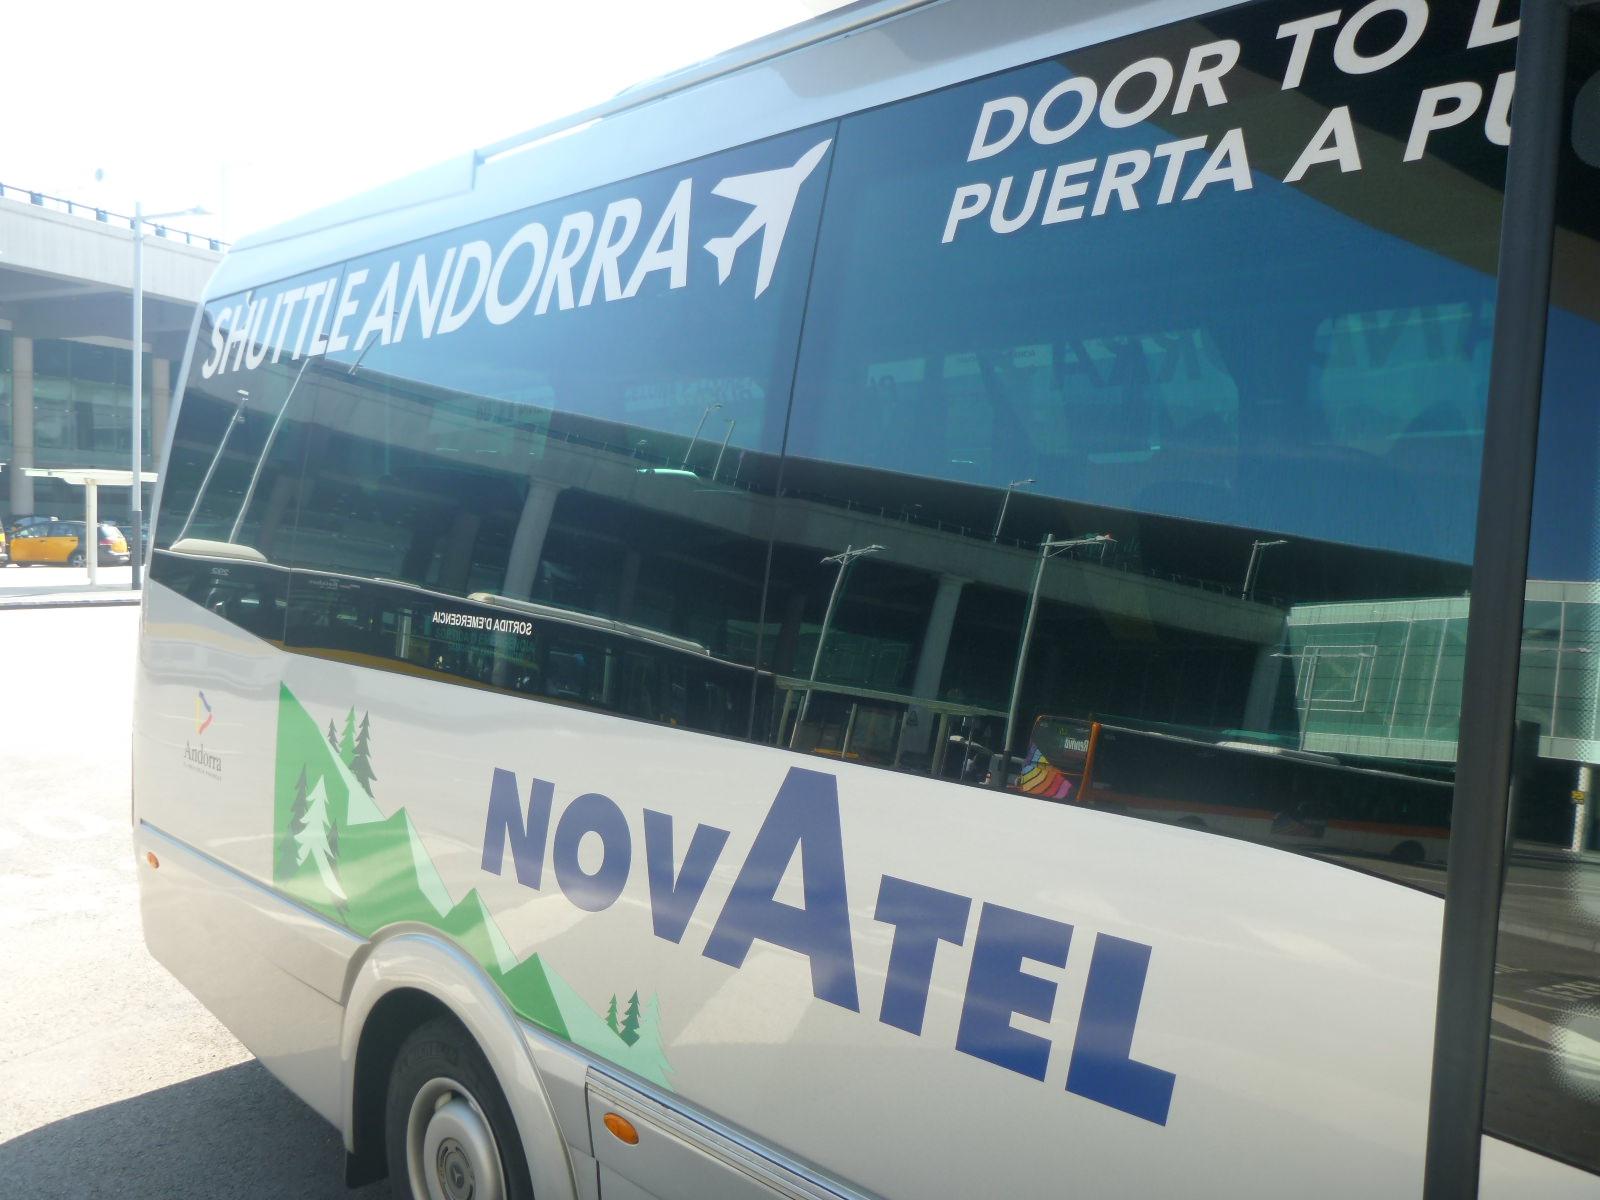 Novatel Bus Station To Andorra